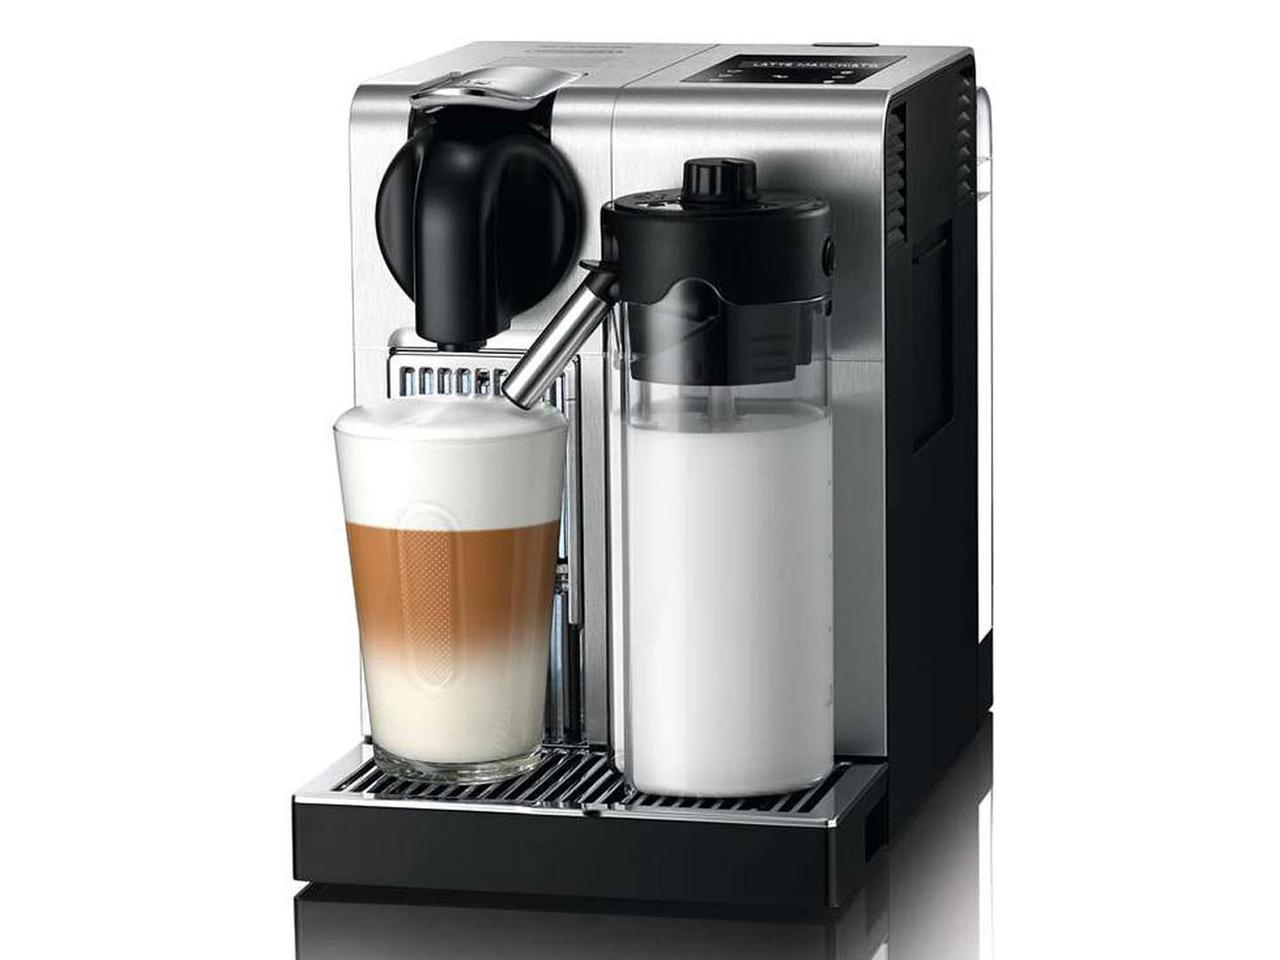 Капсульная кофемашина DeLonghi Nespresso Lattissima Pro EN 750.MB Silver